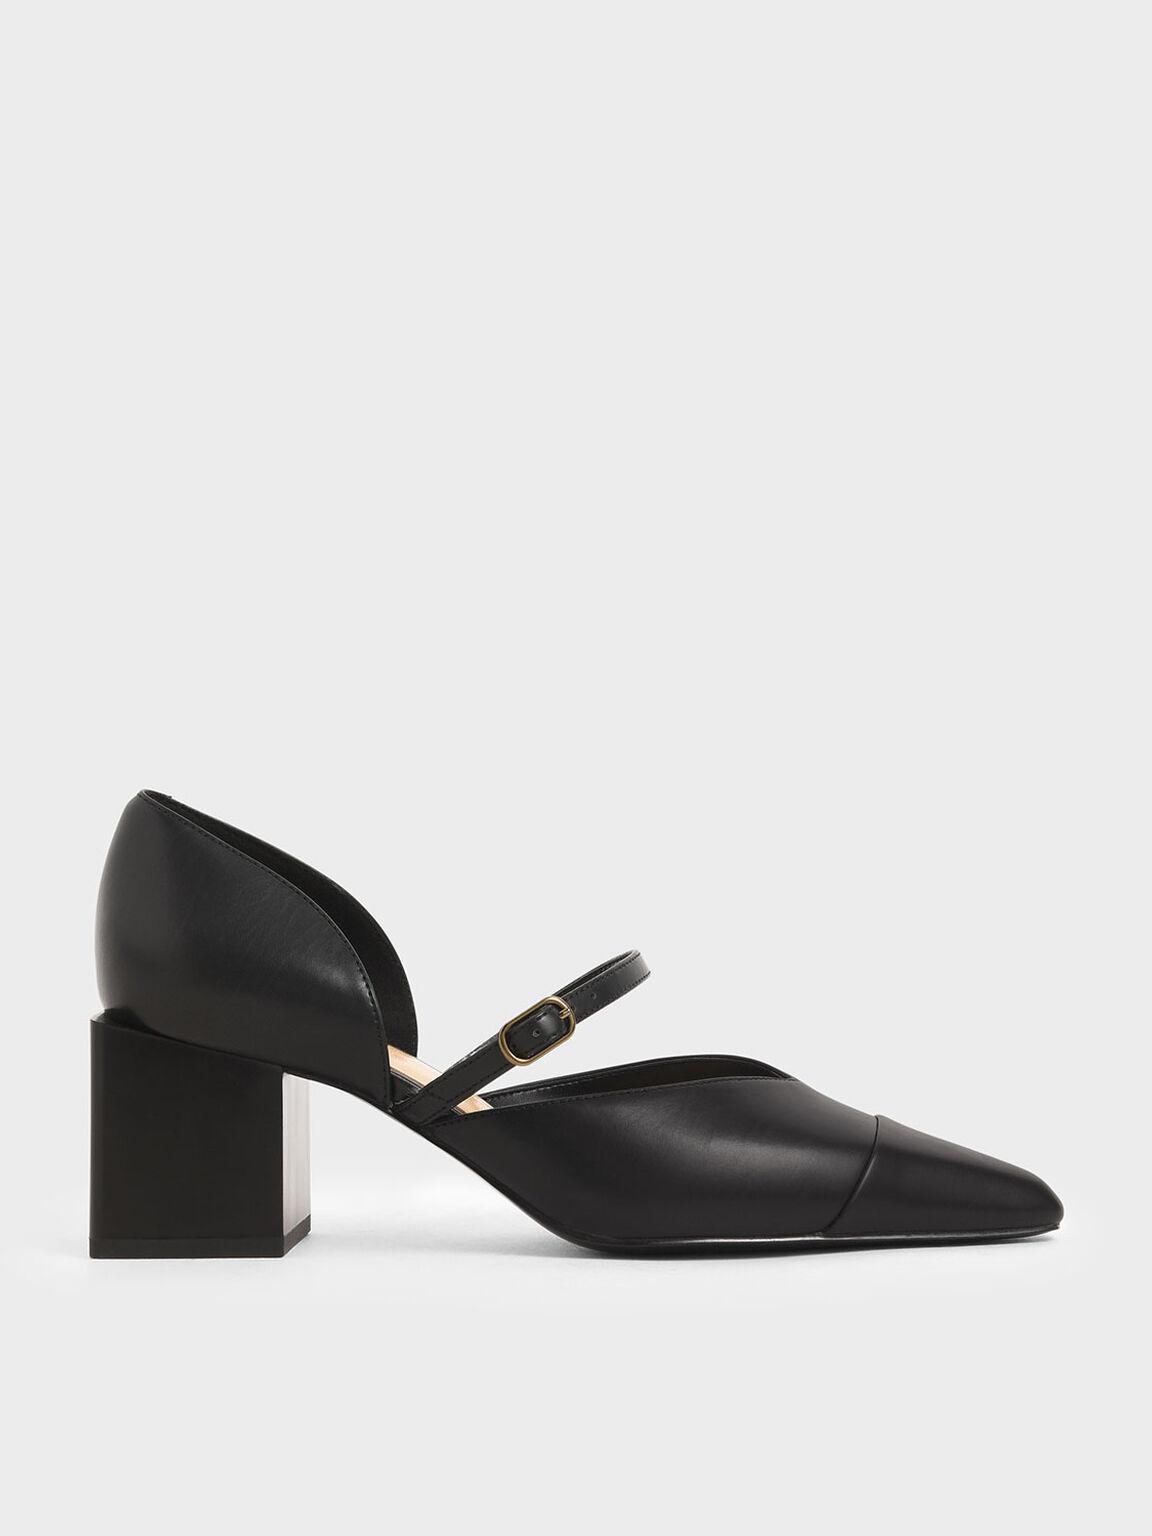 Mary Jane Block Heel Pumps, Black, hi-res